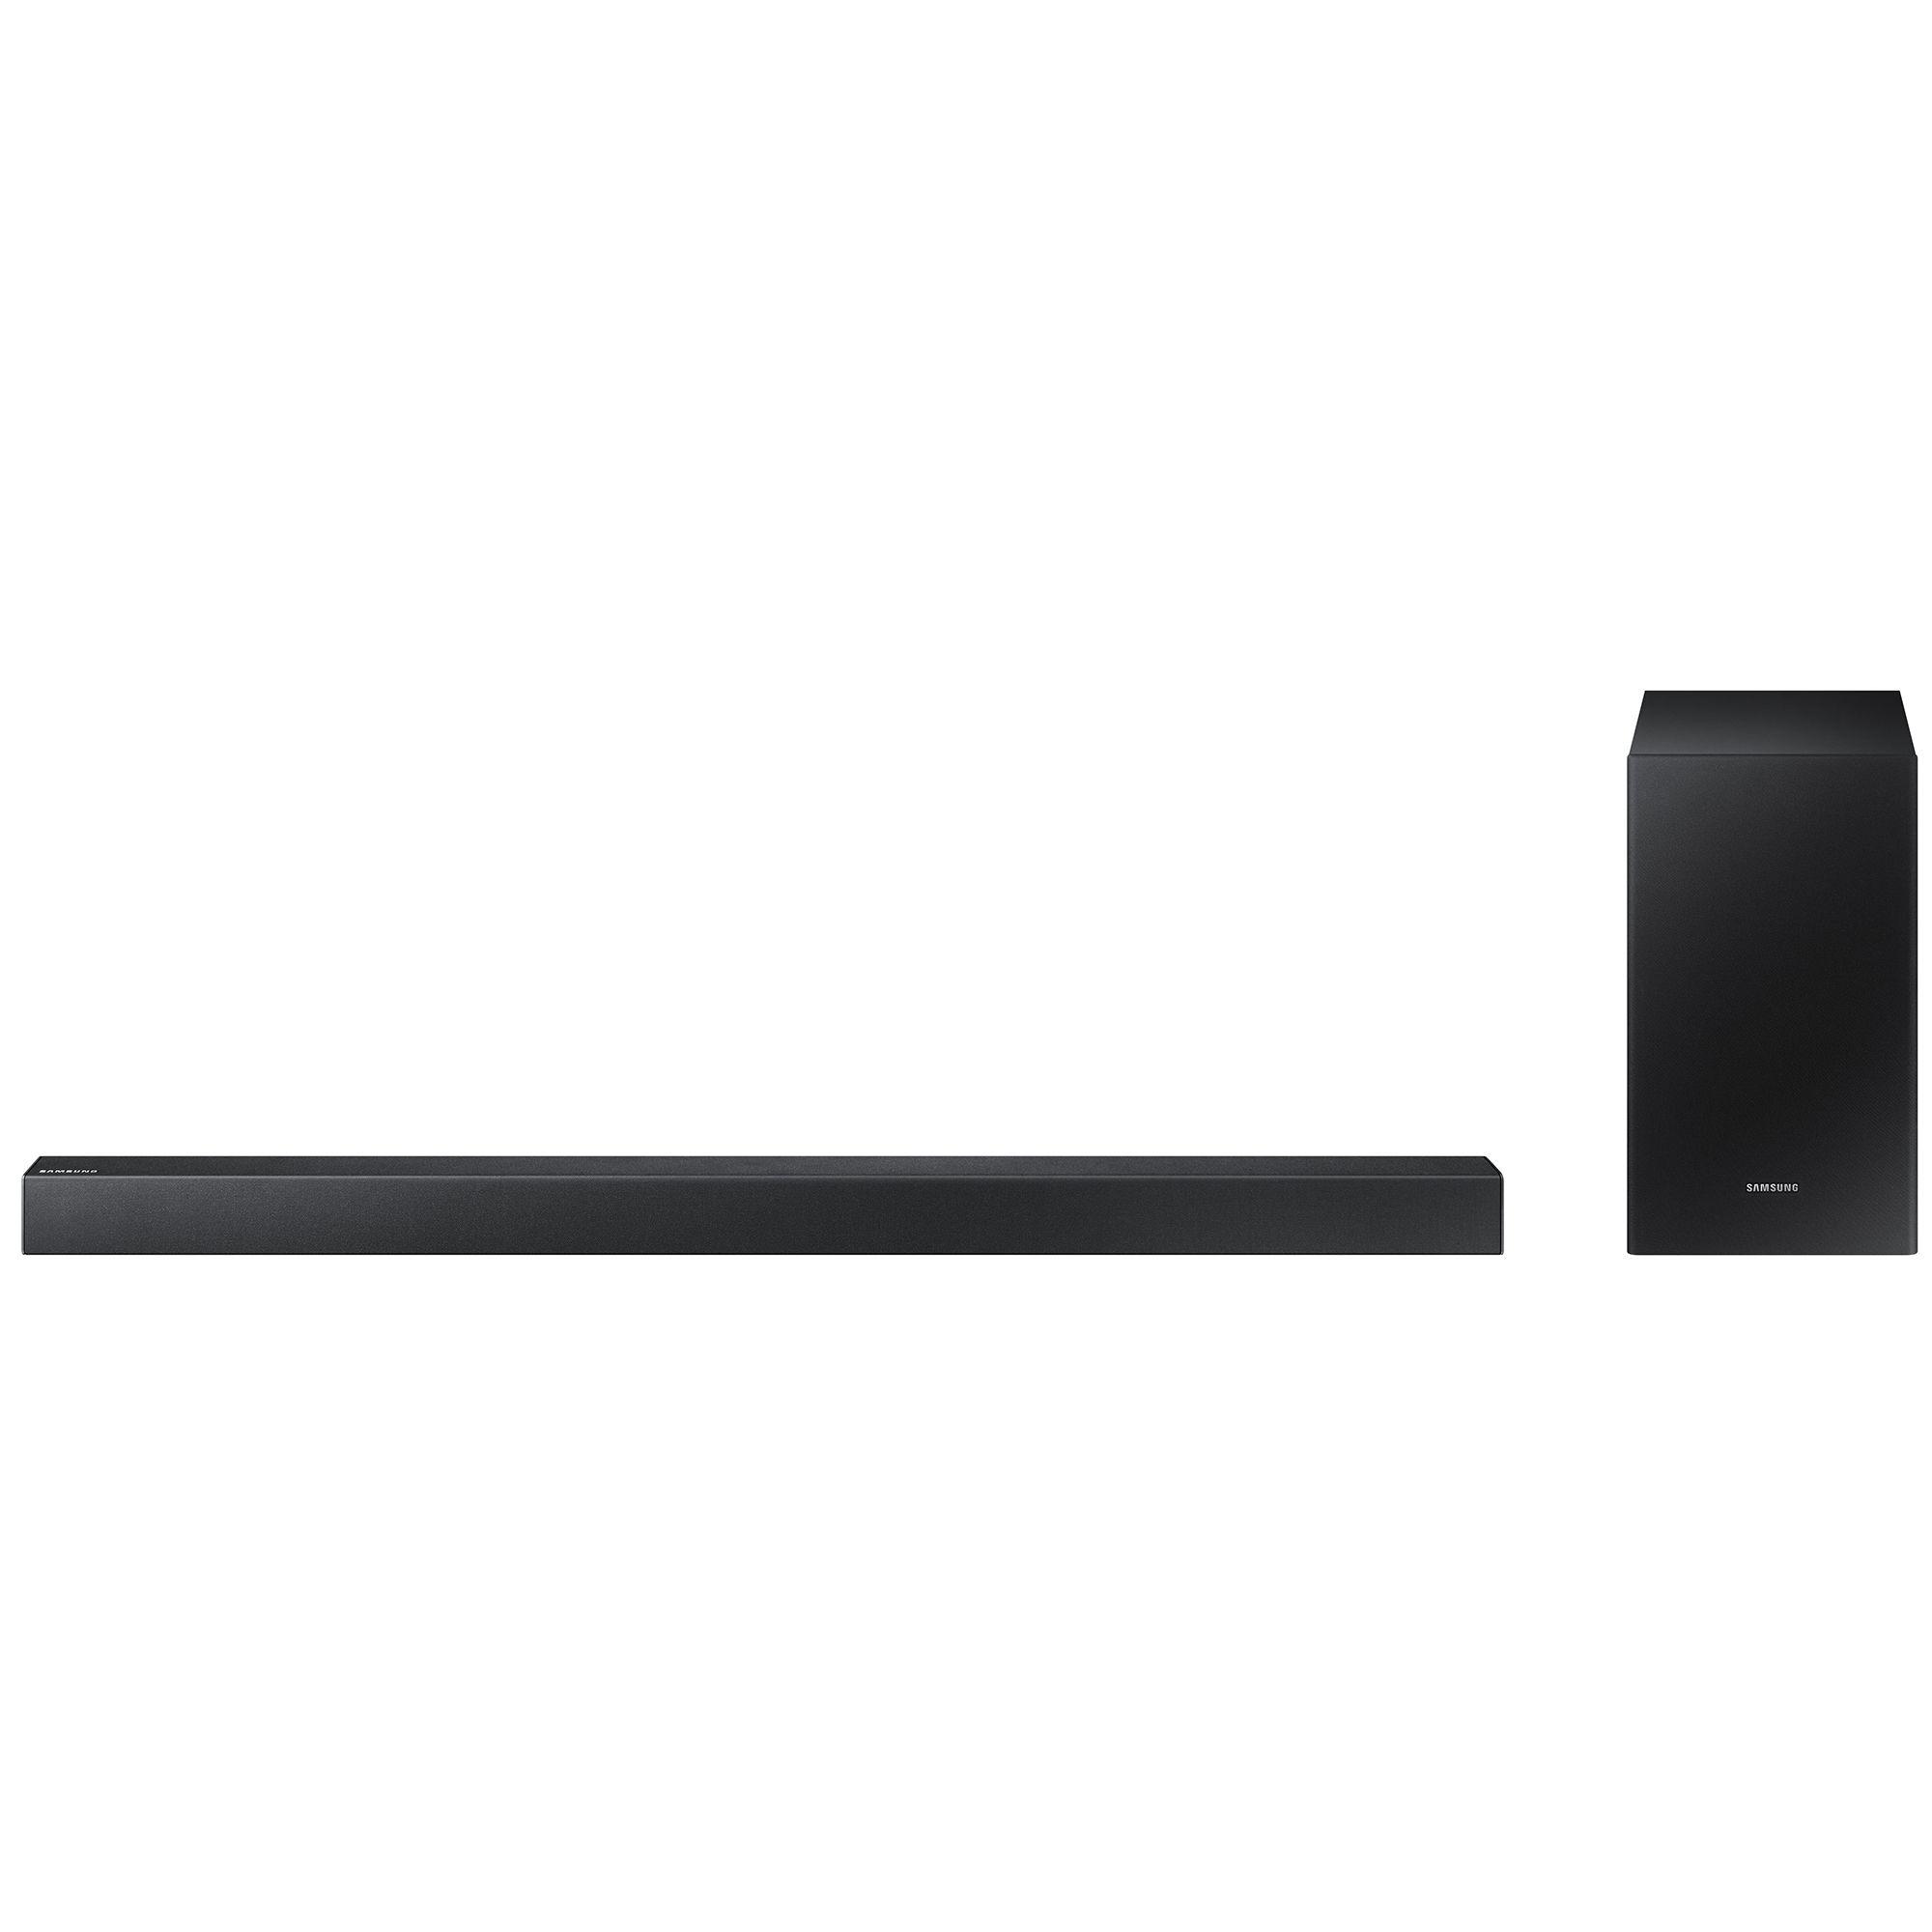 Fotografie Soundbar Samsung HW-R450/EN, 2.1 Canale, 200W, Wireless Subwoofer, Game mode, Negru